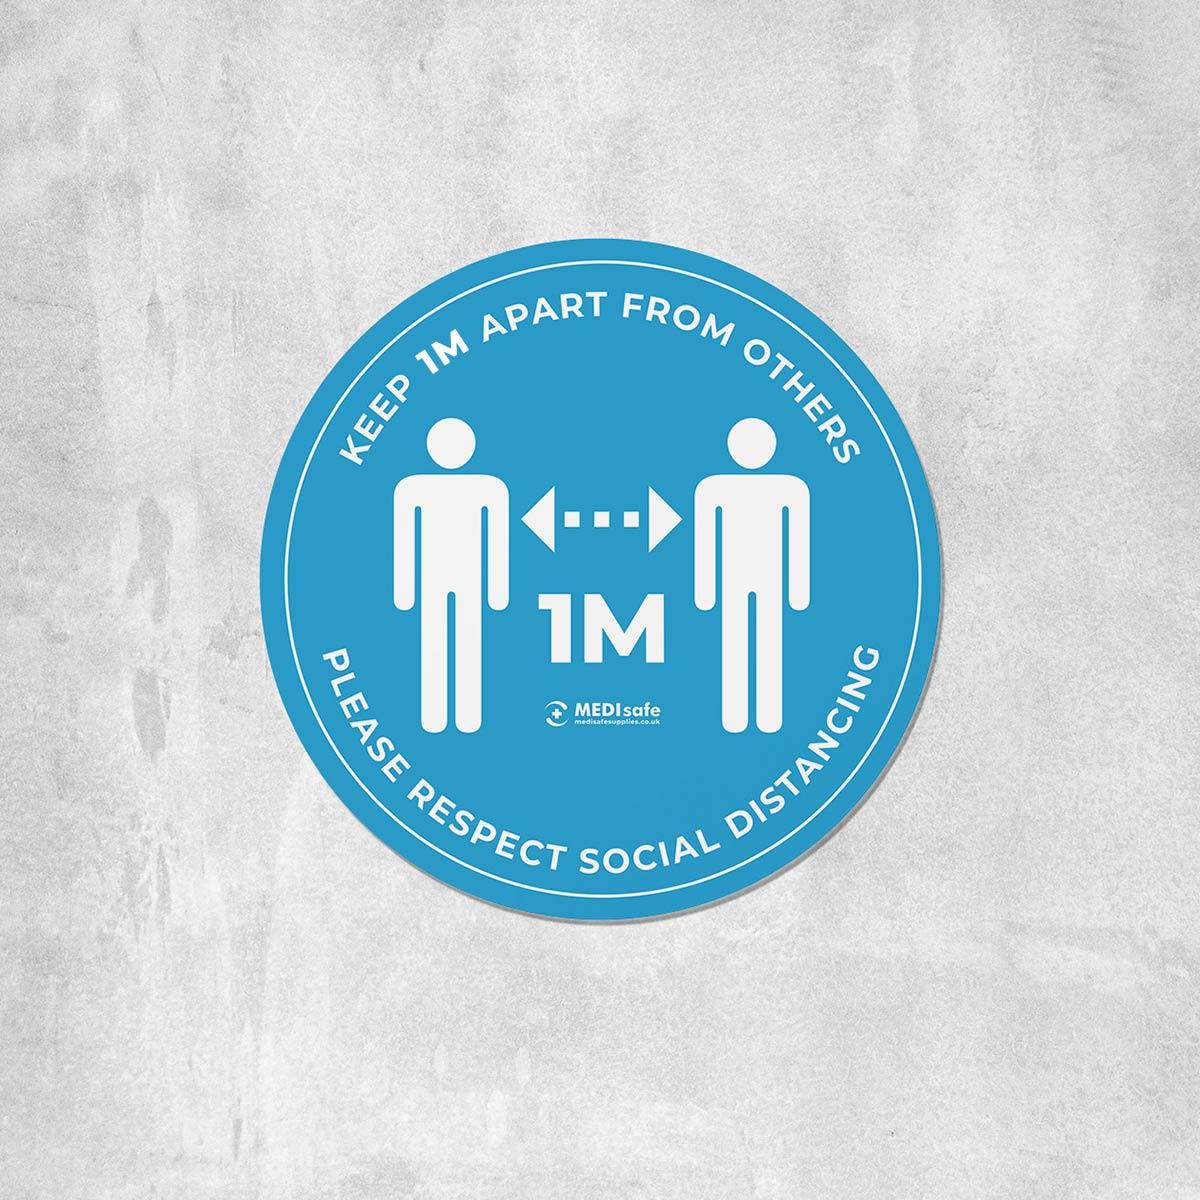 keep 1m apart social distancing floor stickers blue